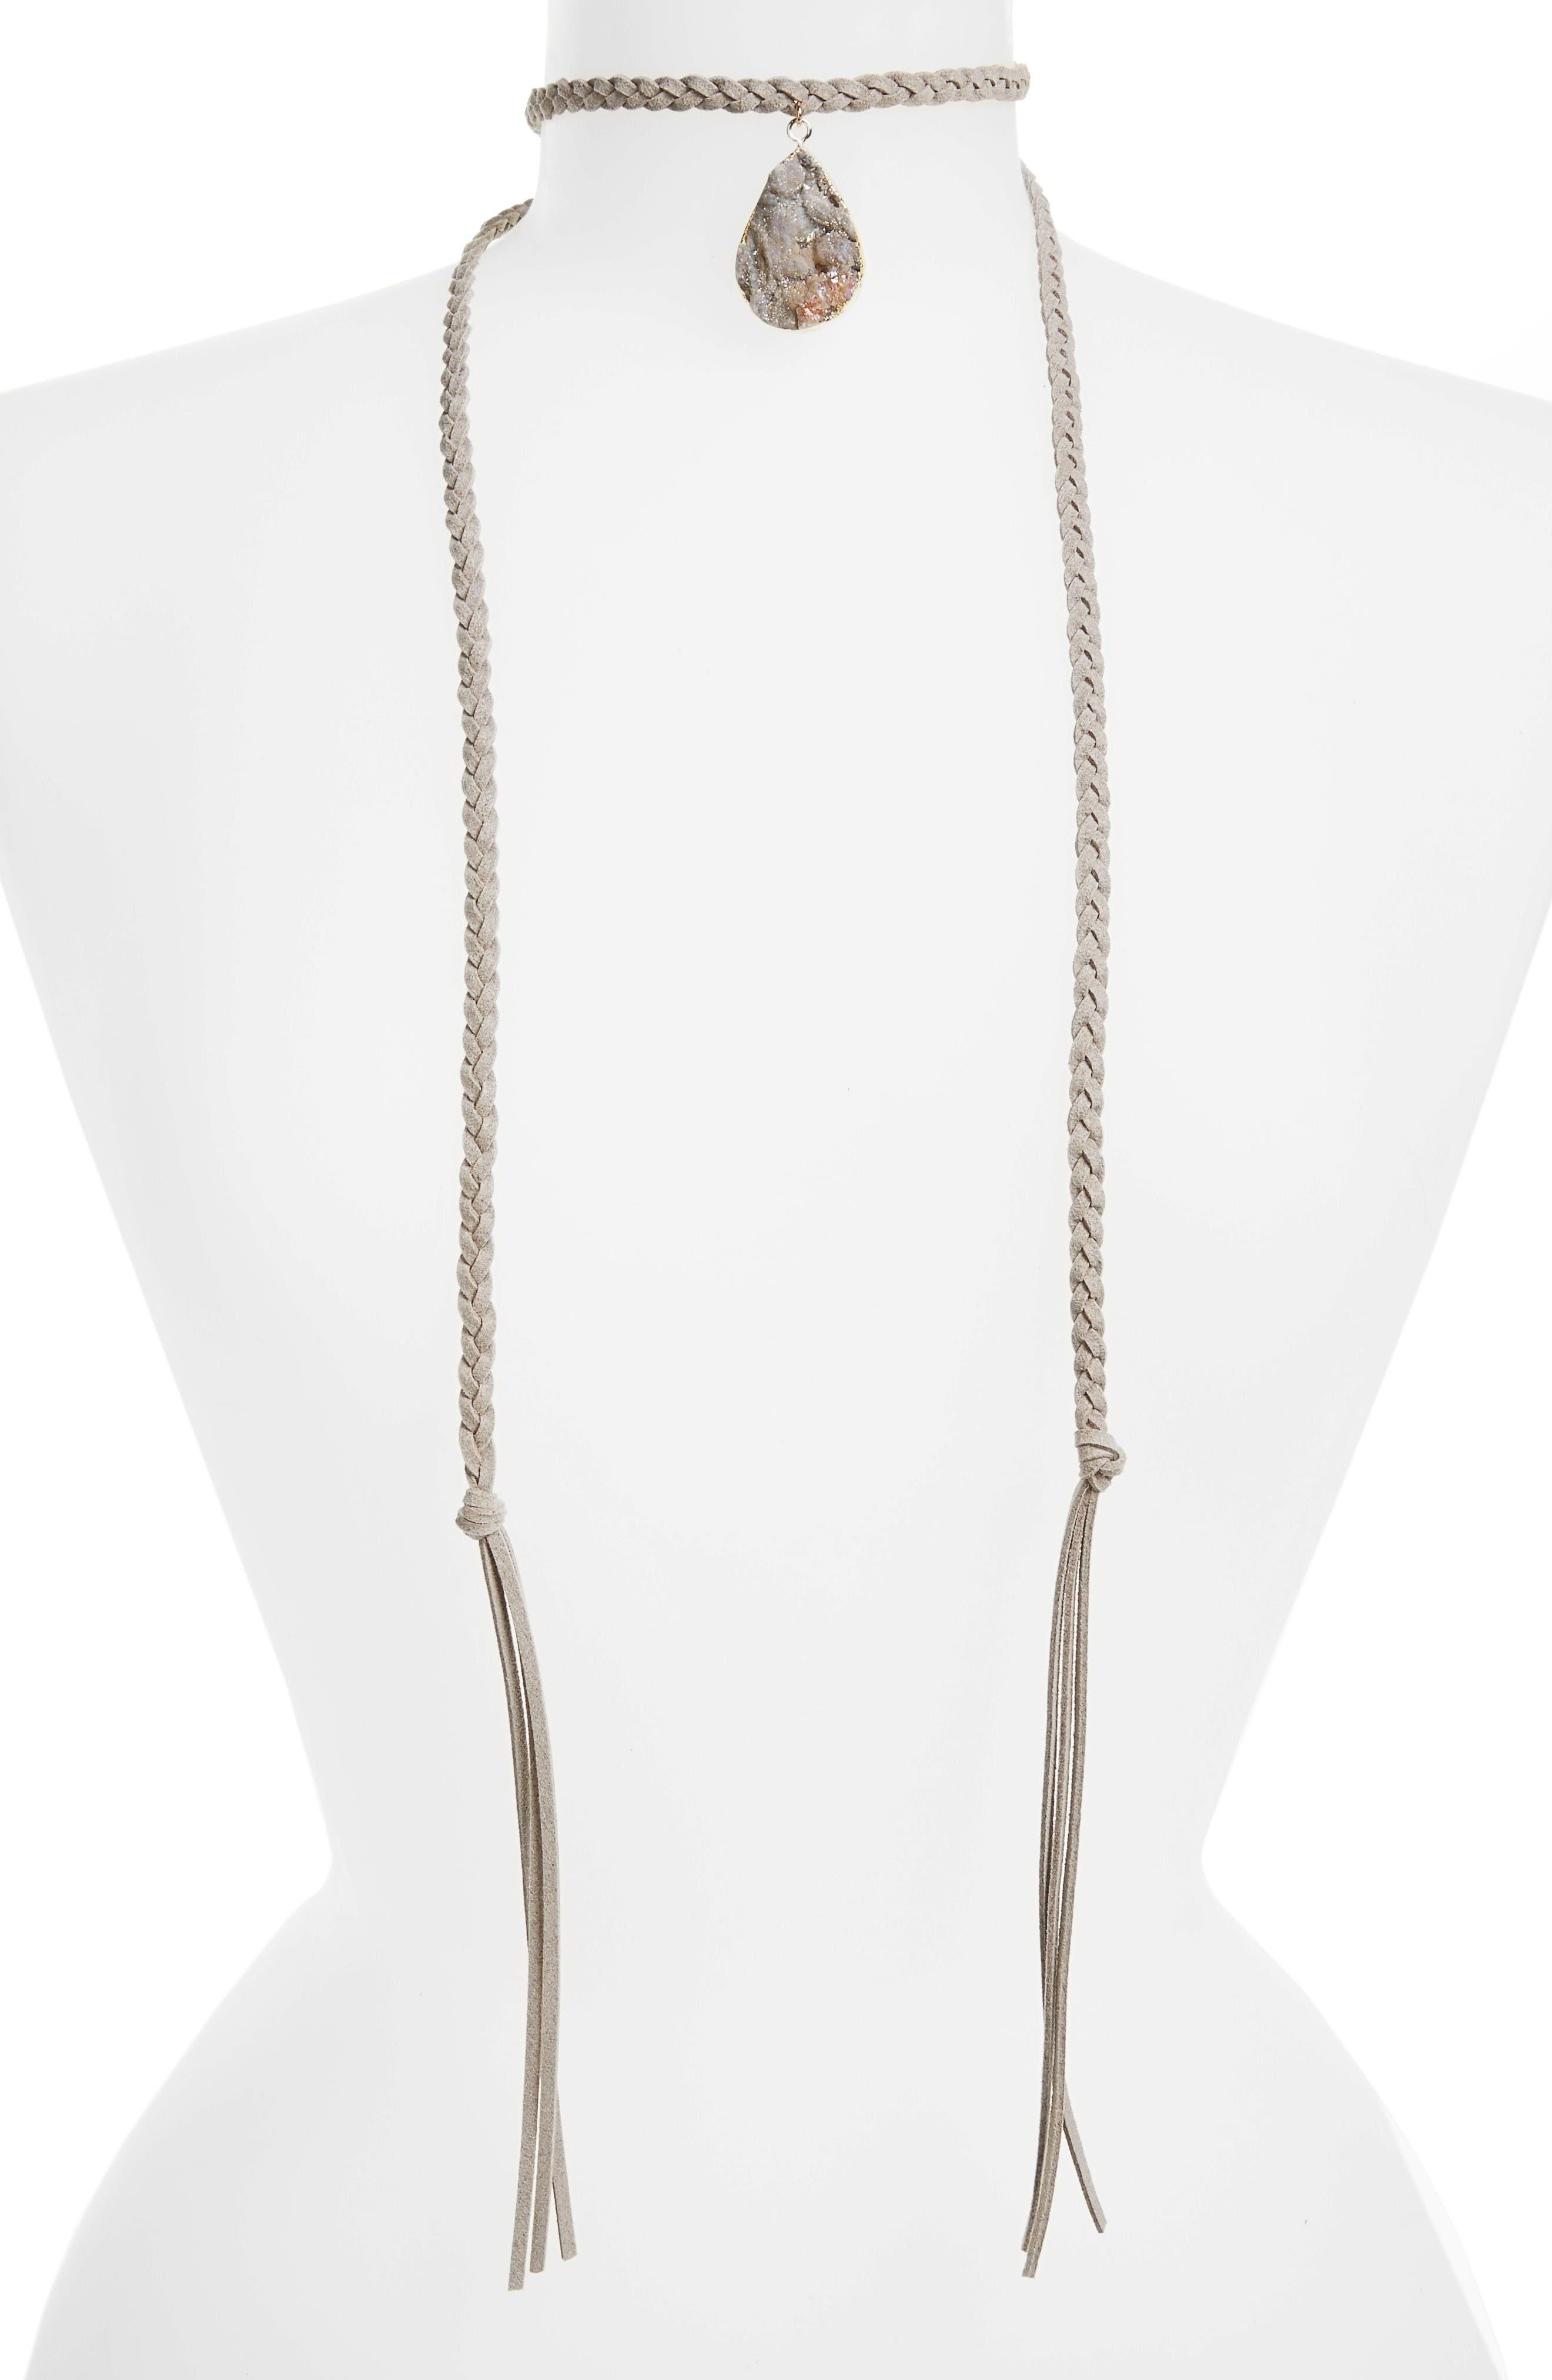 Main Image - Panacea Long Wrap Choker Necklace